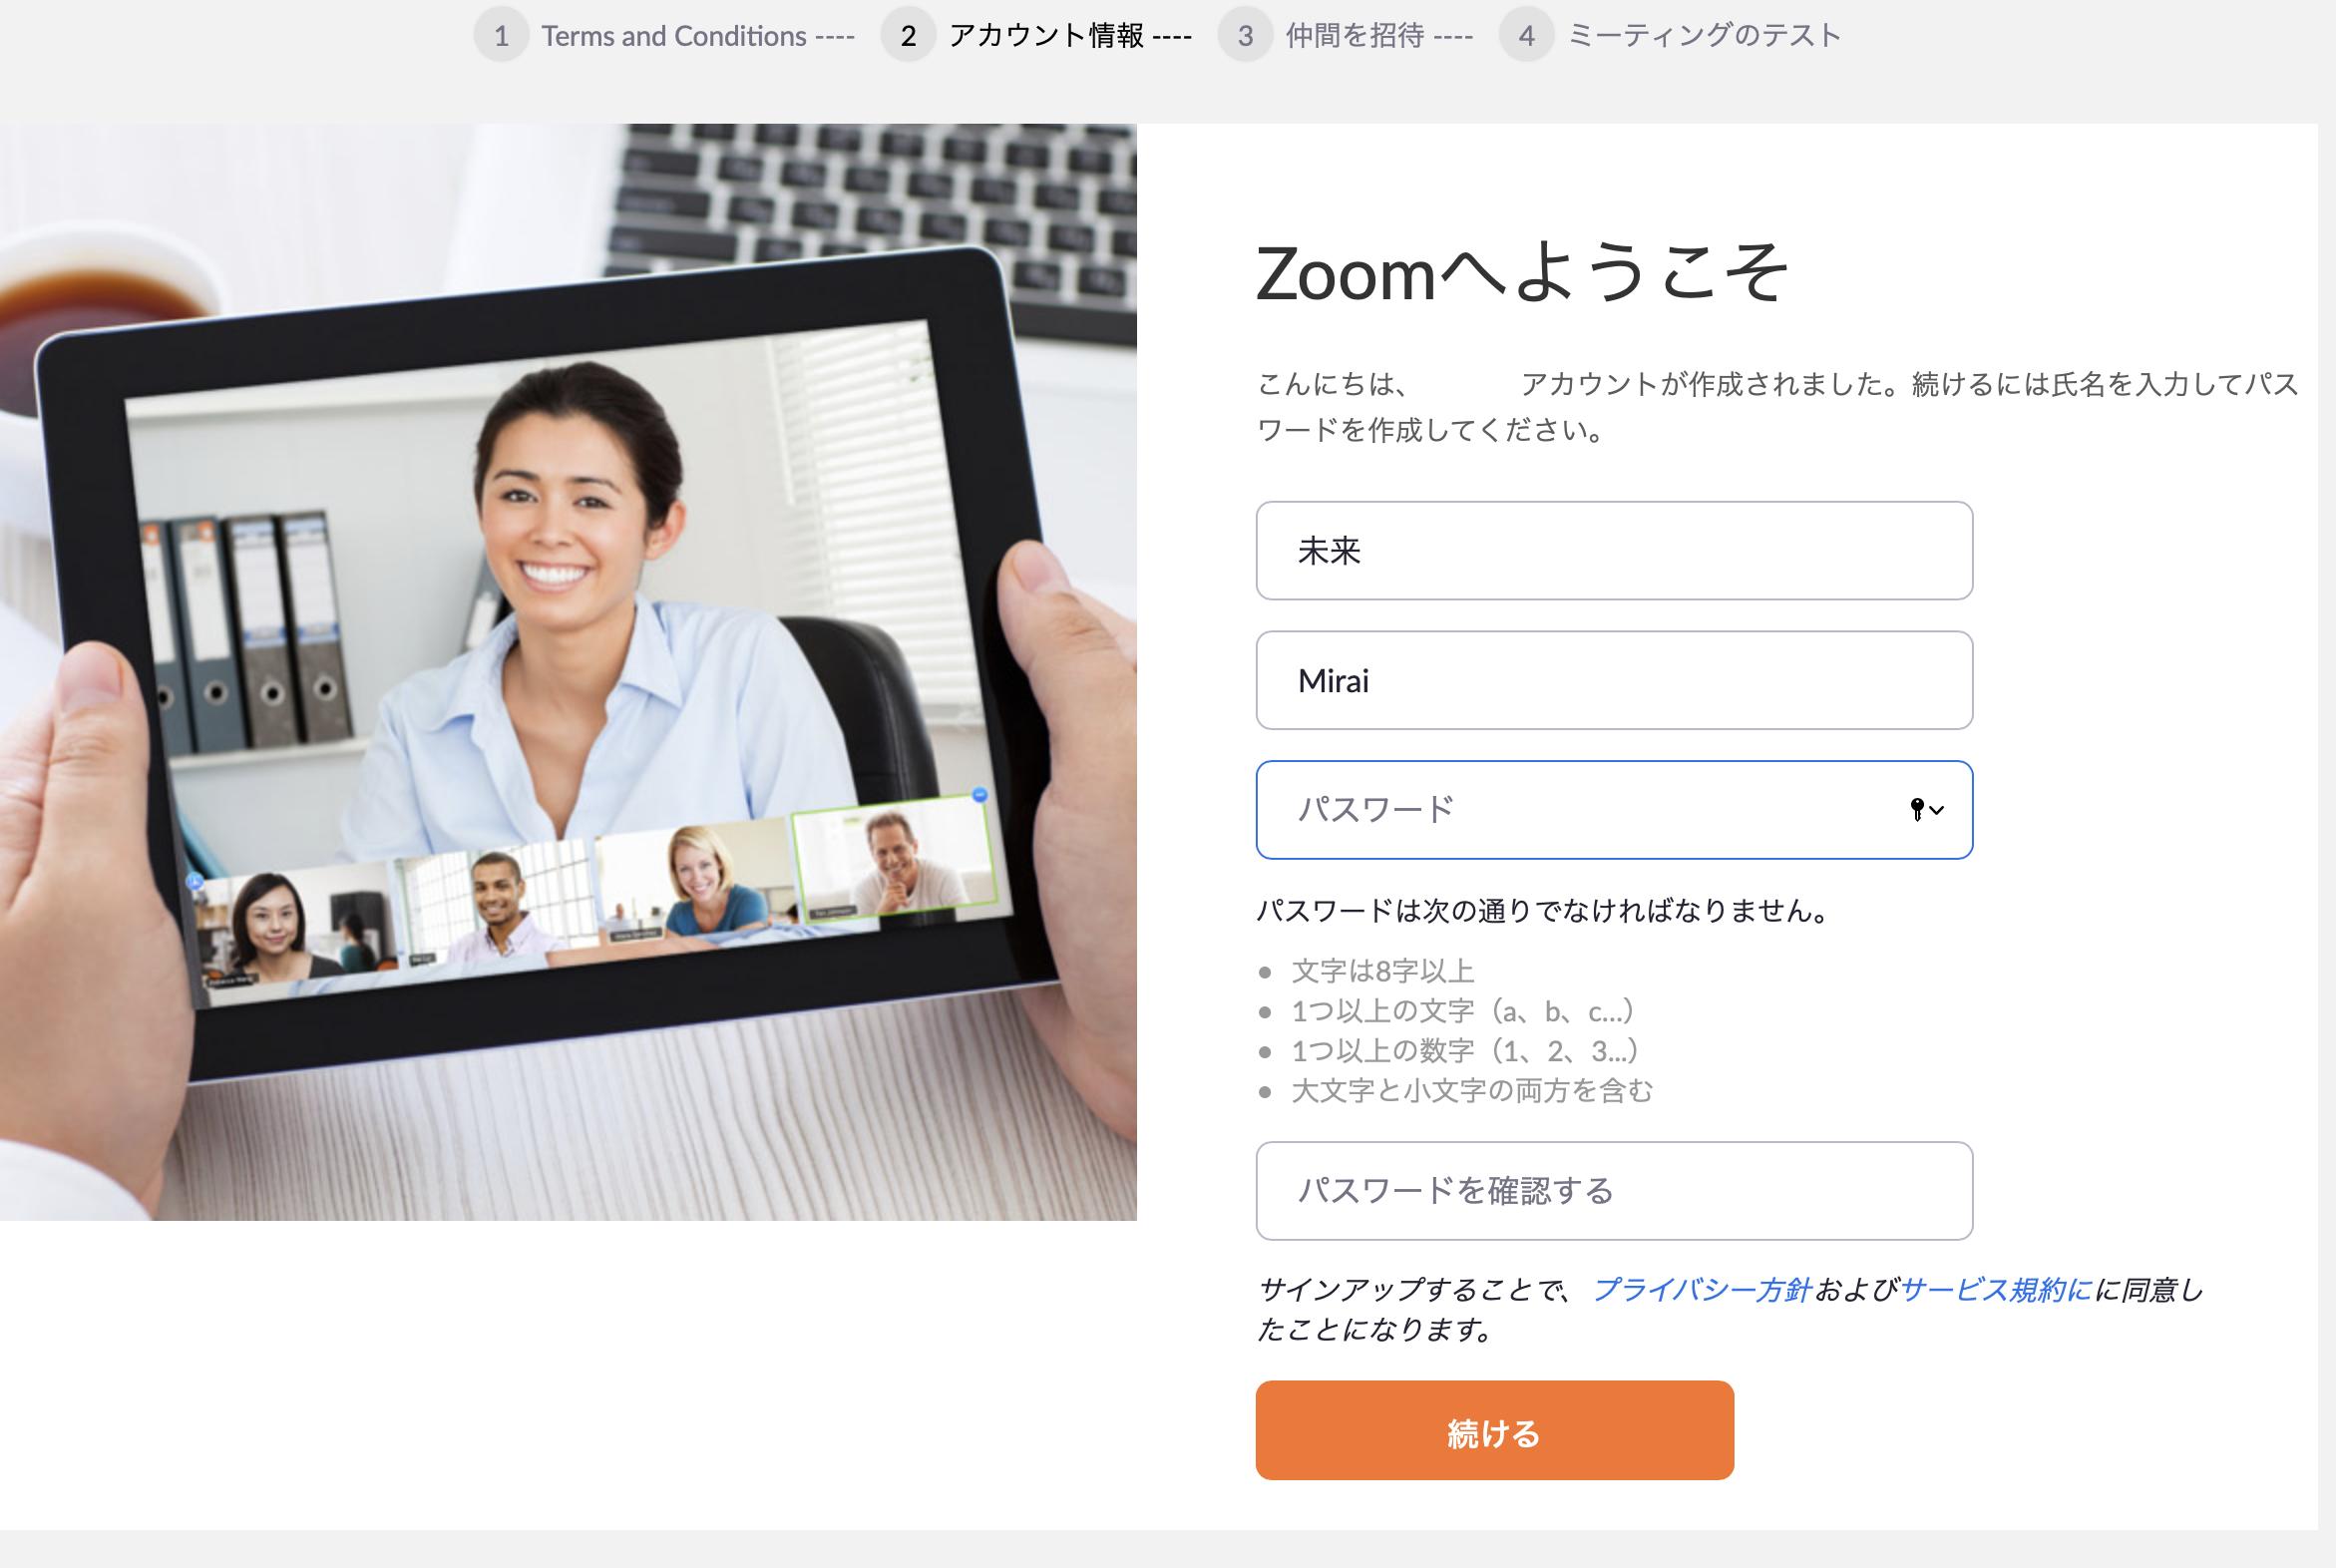 zoom参加方法をまとめてみた!